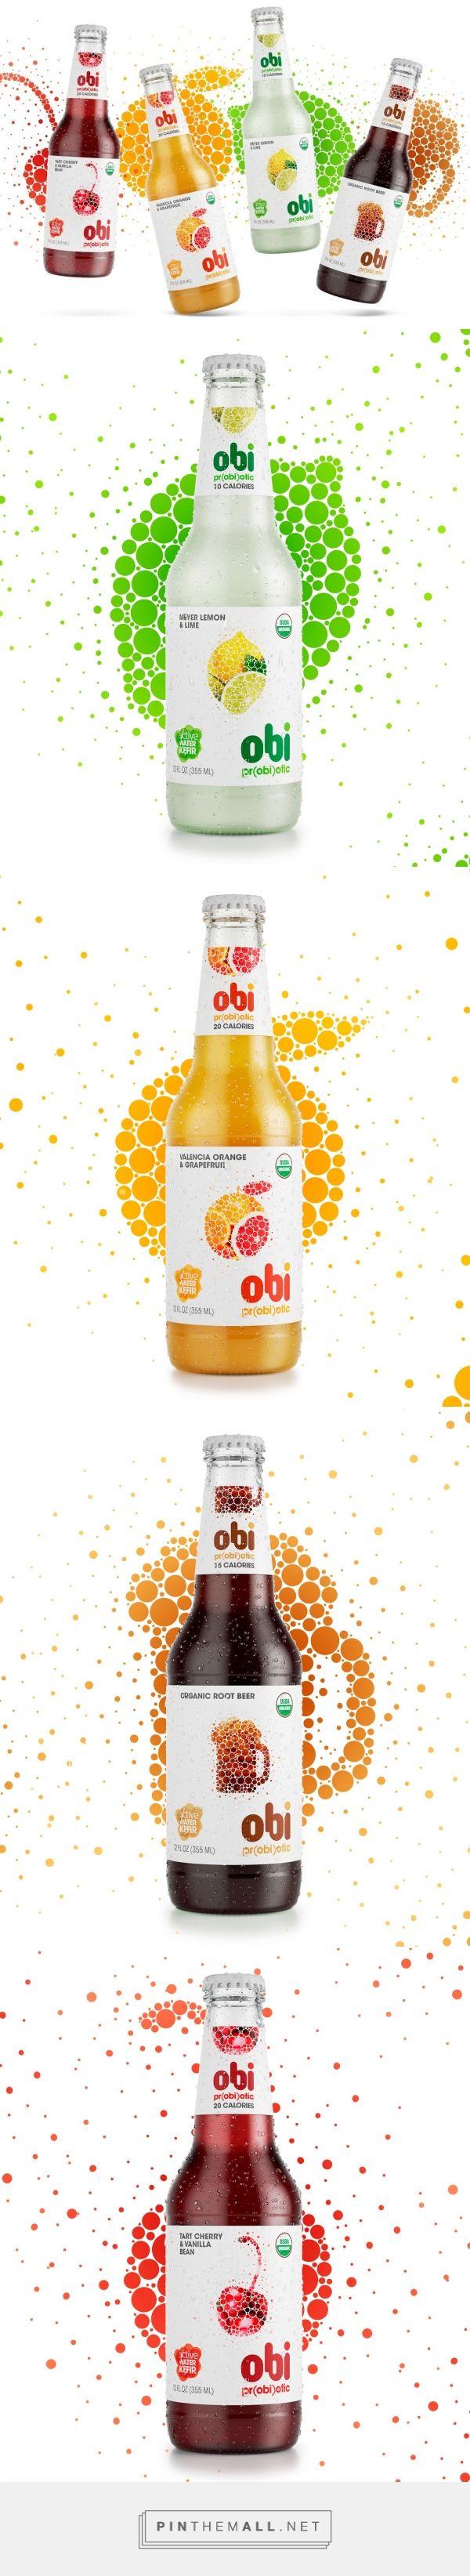 Lovely bubbles on Obi Pr(obi)otic Soda label - design by The Creative Method - http://www.packagingoftheworld.com/2016/05/obi-probiotic-soda.html